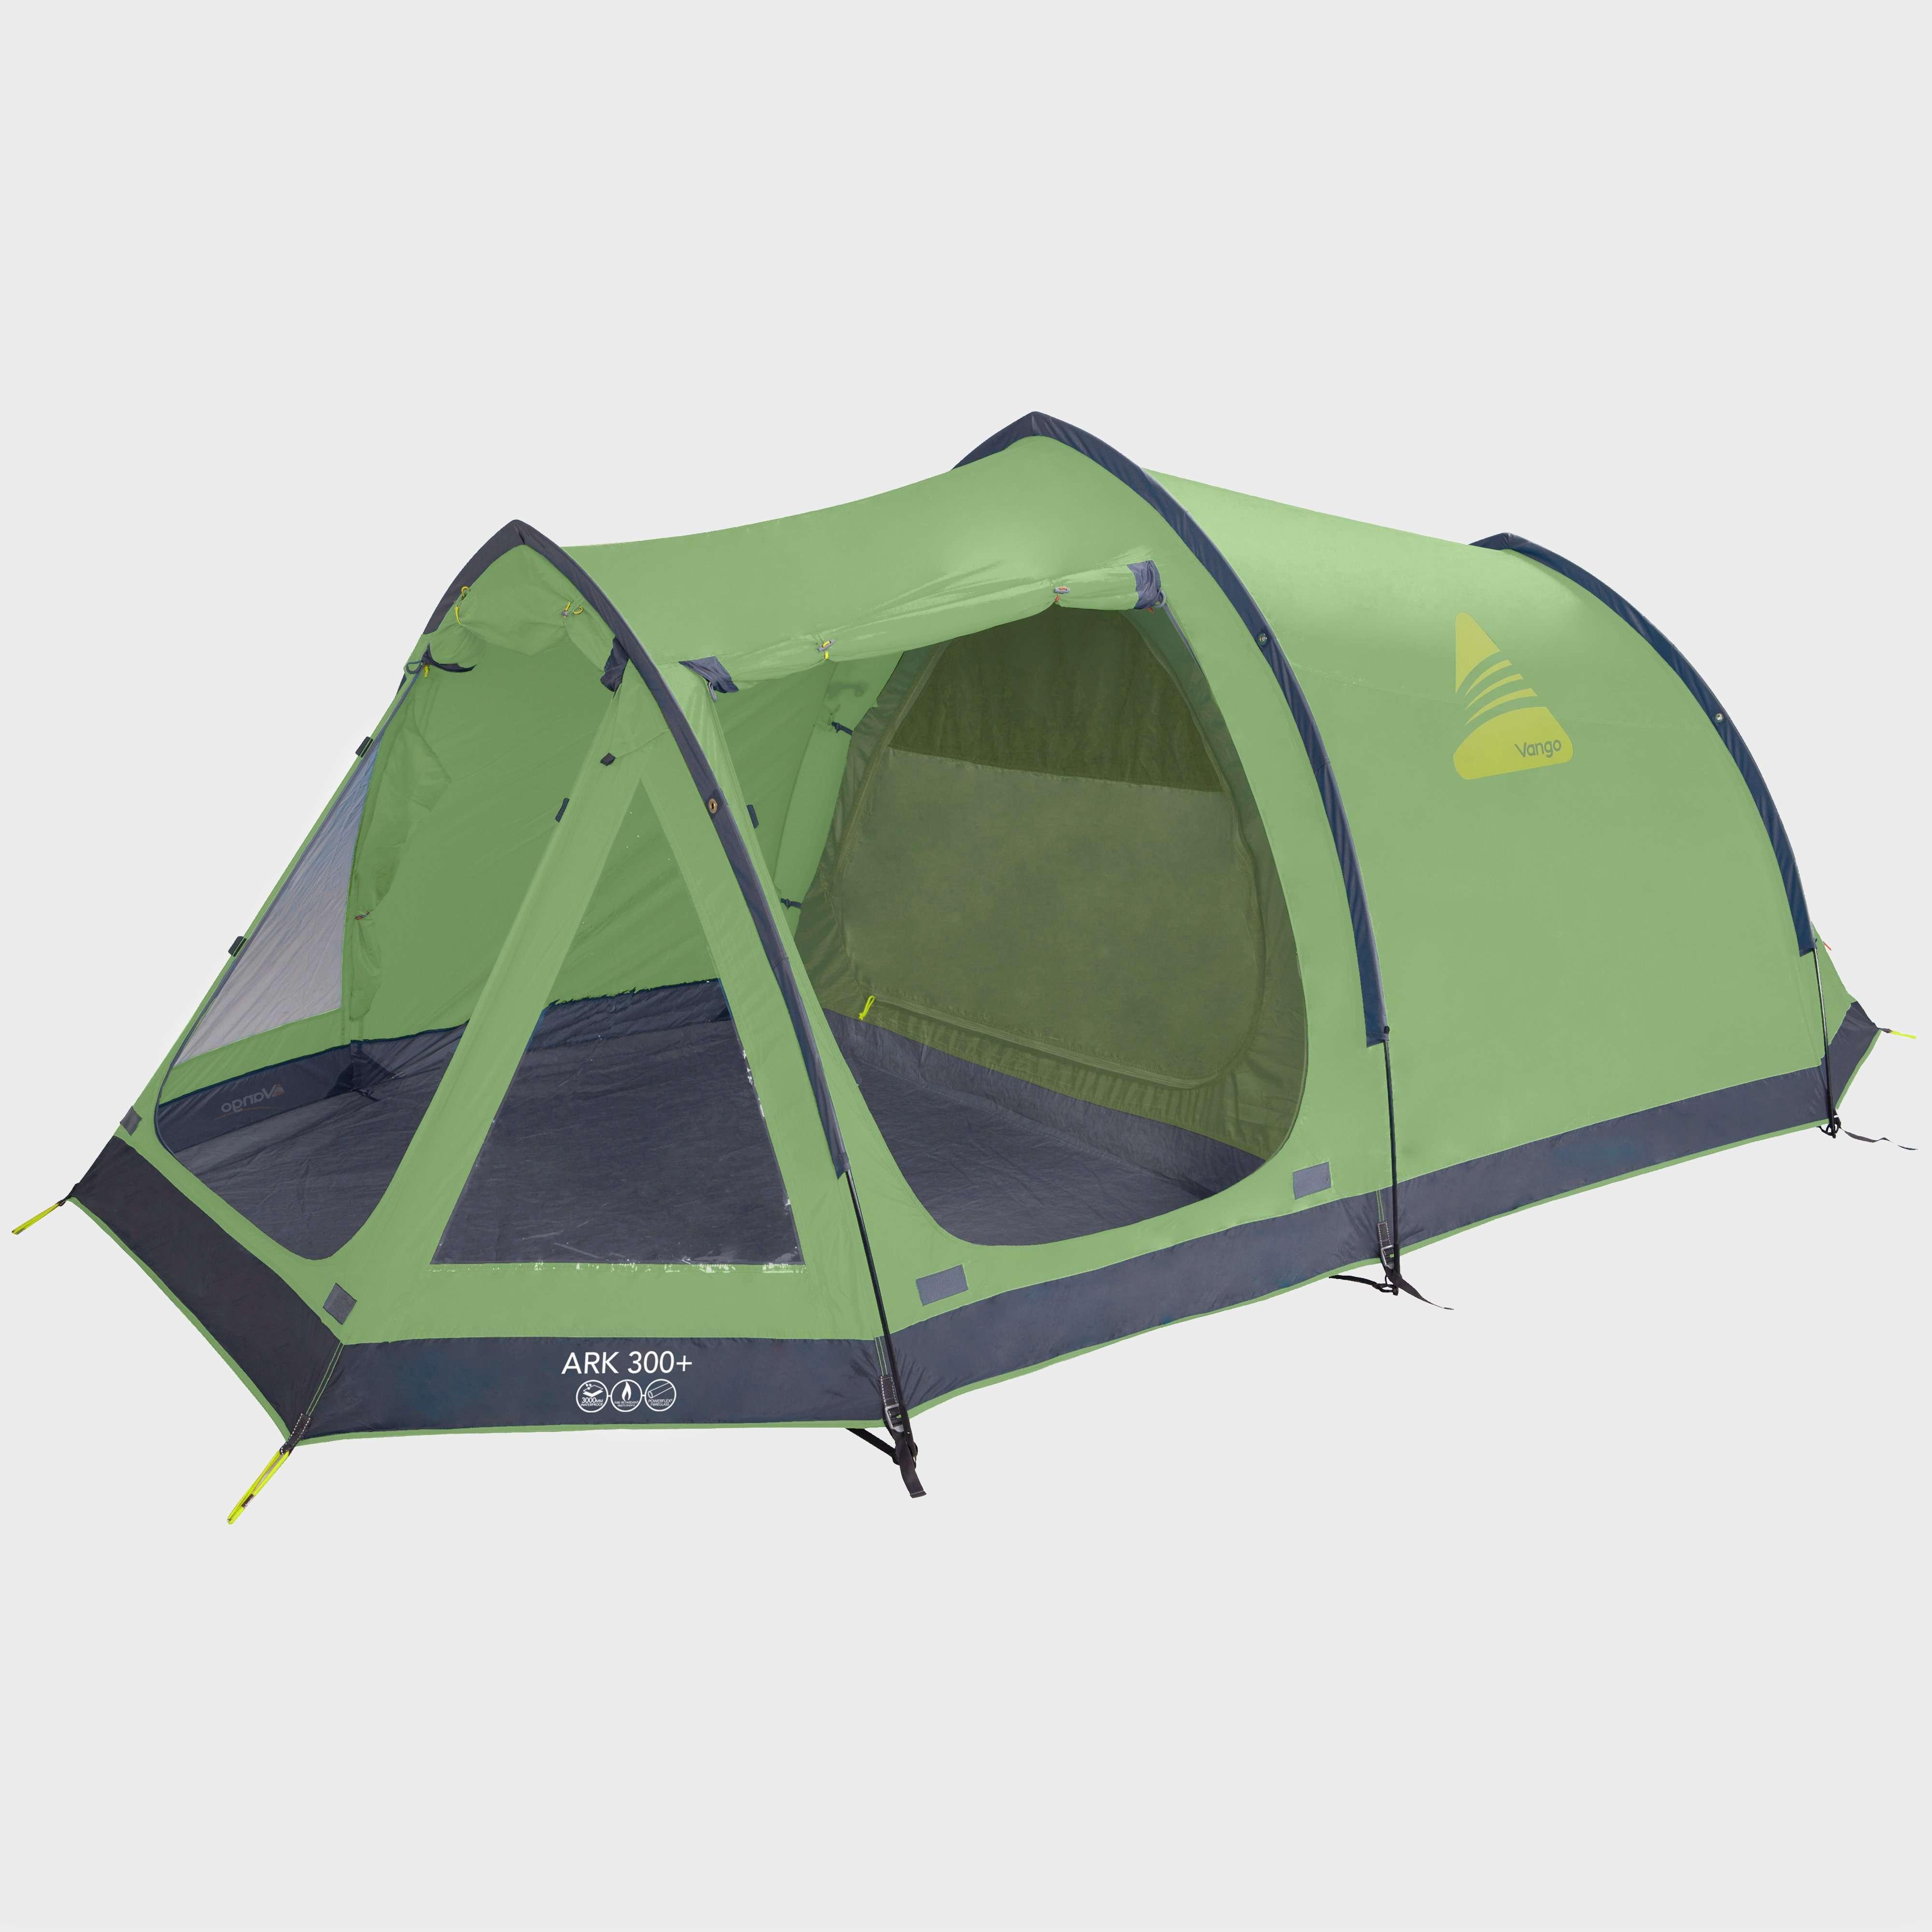 VANGO Ark 300 Plus 3 Man Tunnel Tent